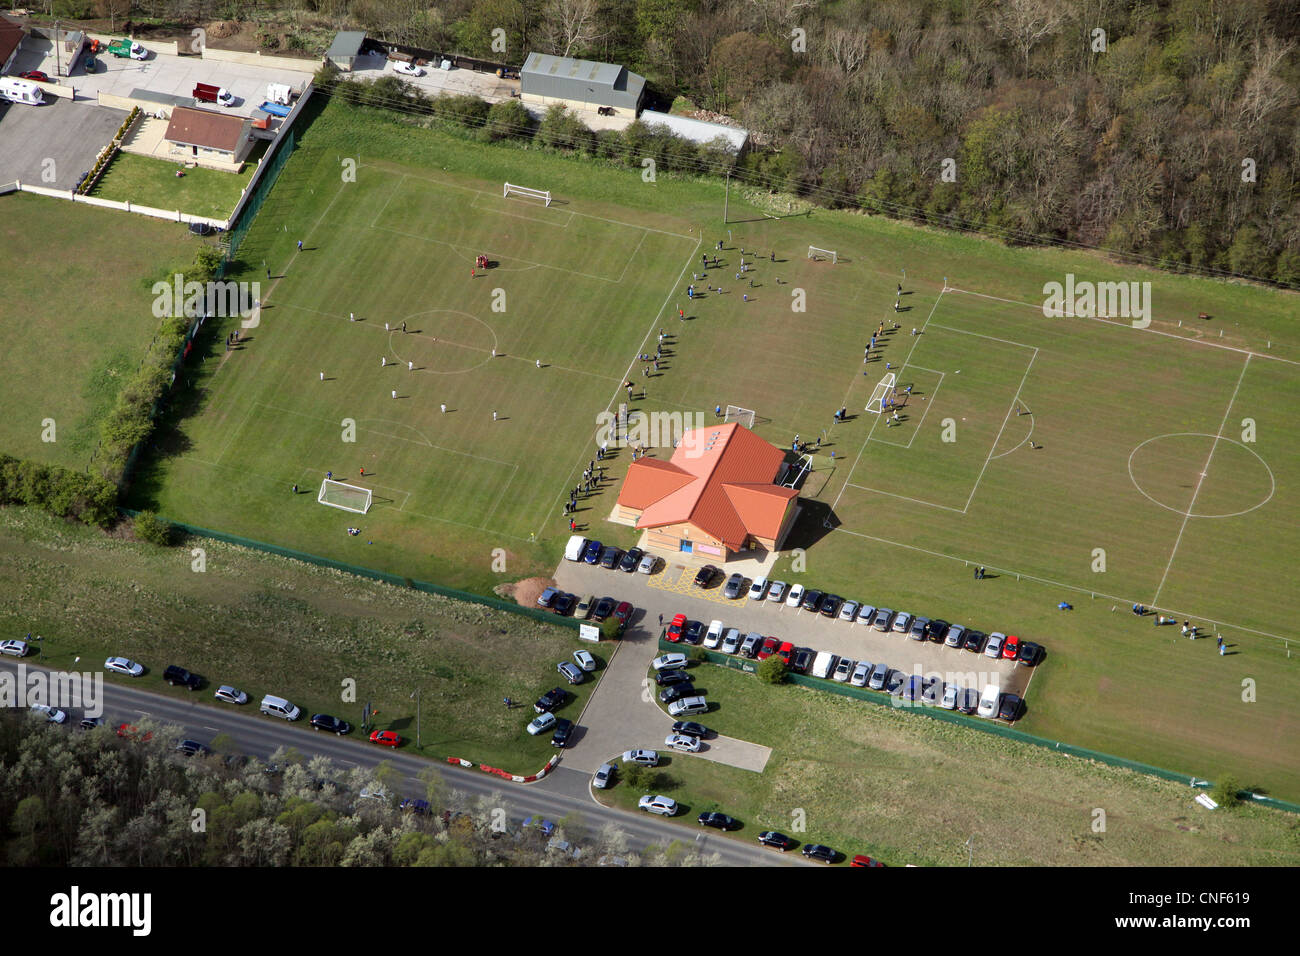 Luftbild des Sonntagmorgen Fußballs im Tibs Football Club, Thornaby, Stockton on Tees Stockfoto